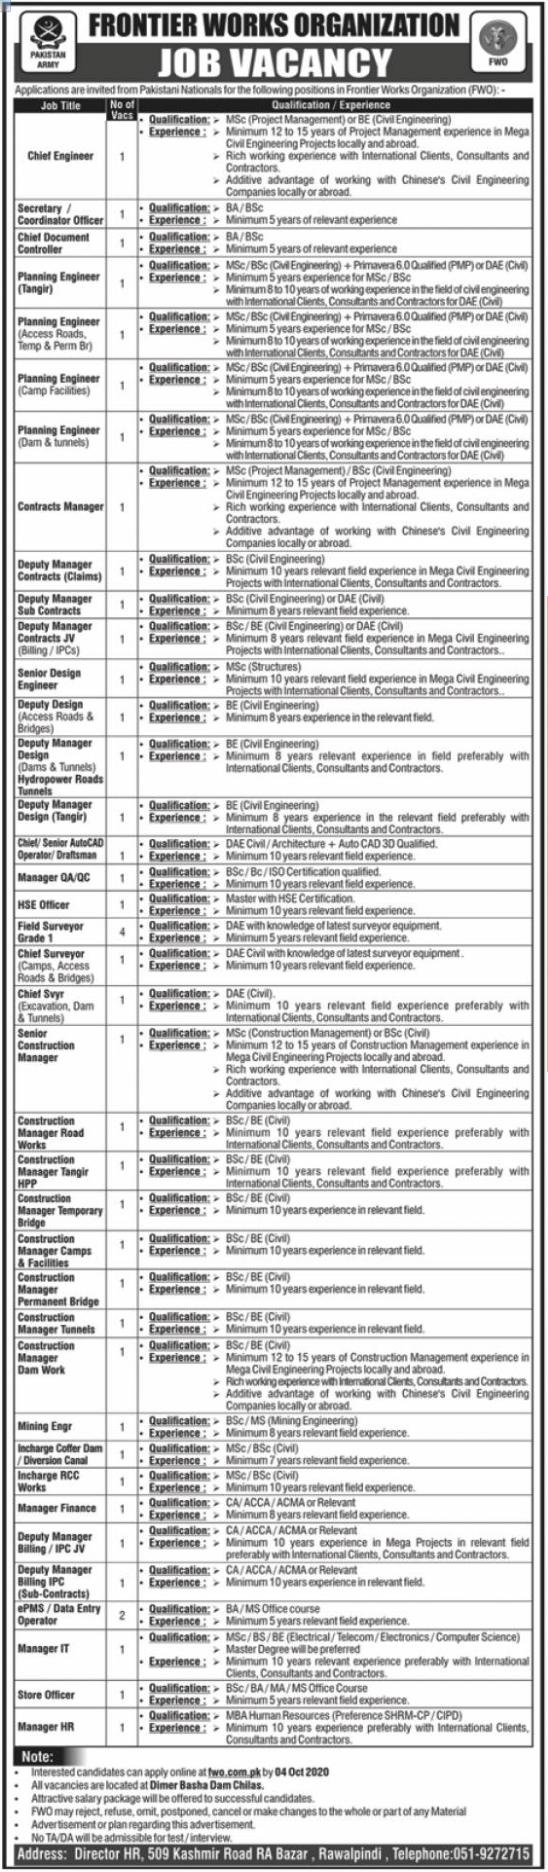 Pakistan Army Frontier Works Organization FWO Jobs 2020